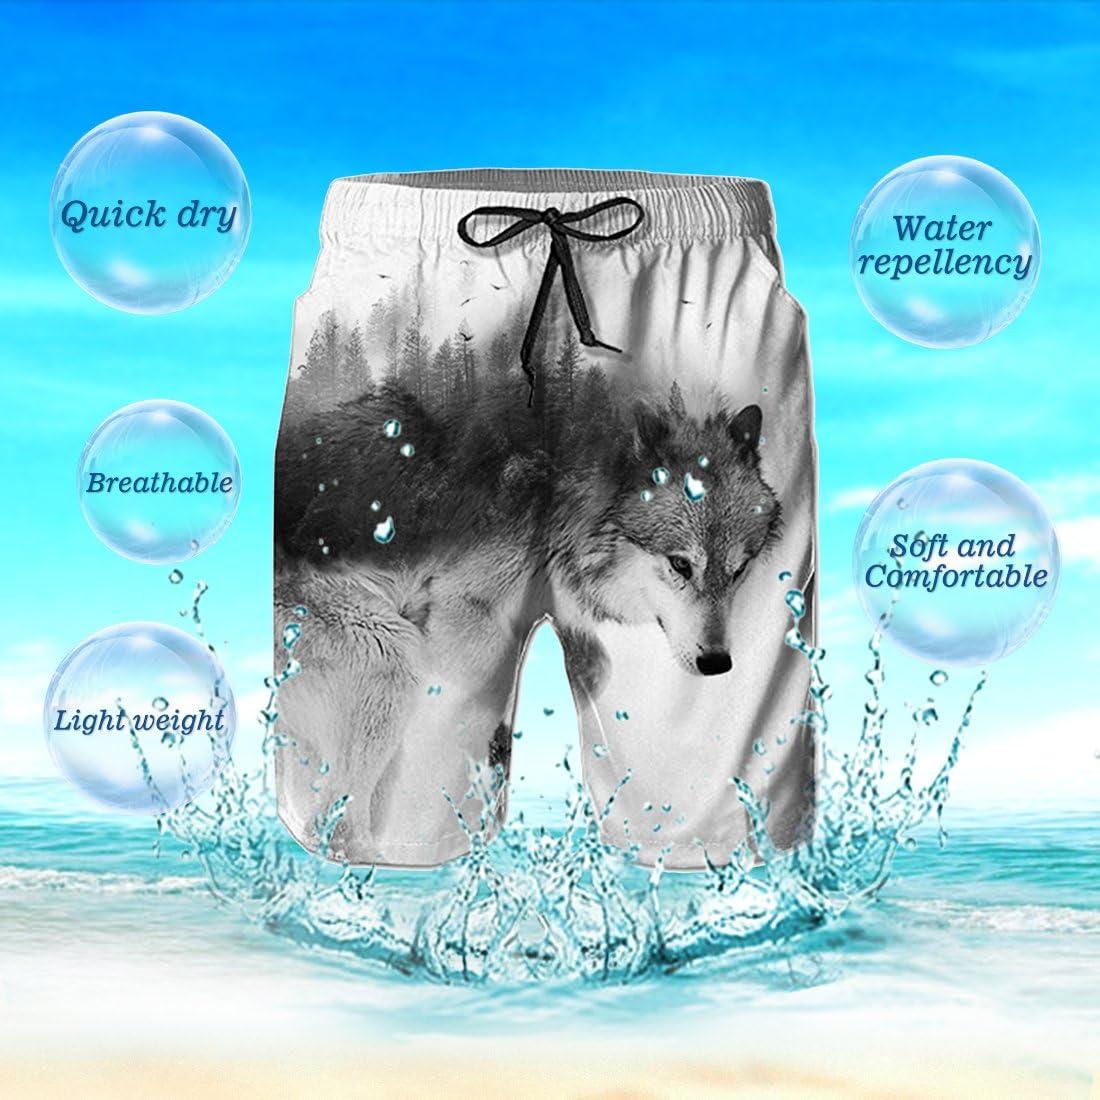 Idgreatim Mens Swim Trunk 3D Print Graphic Summer Beach Shorts Surfing Trunks